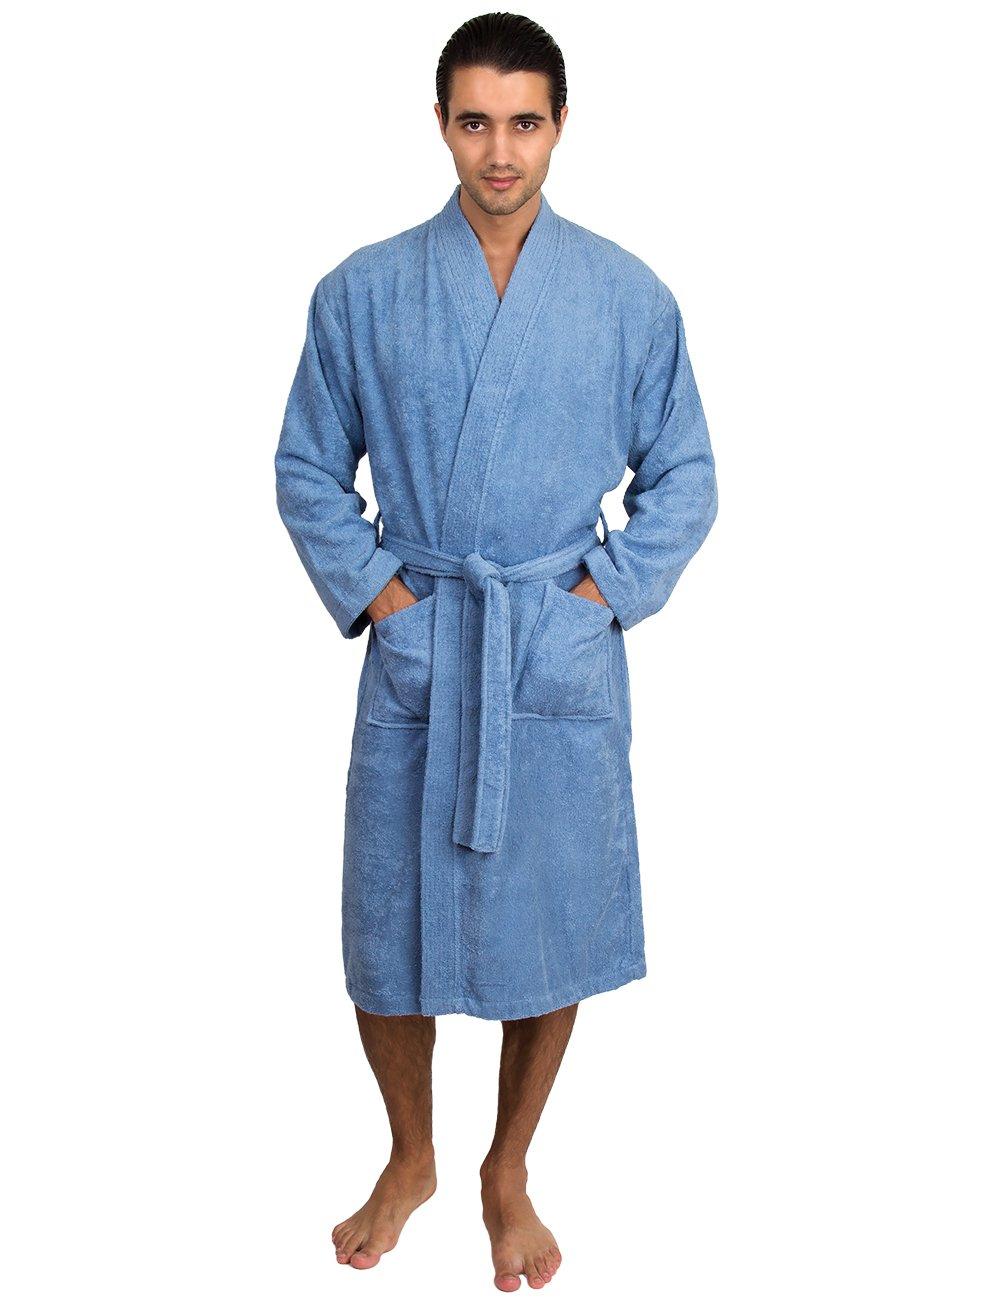 TowelSelections SLEEPWEAR メンズ B00J0BV4R8 Large / X-Large|ブルー ブルー Large / X-Large